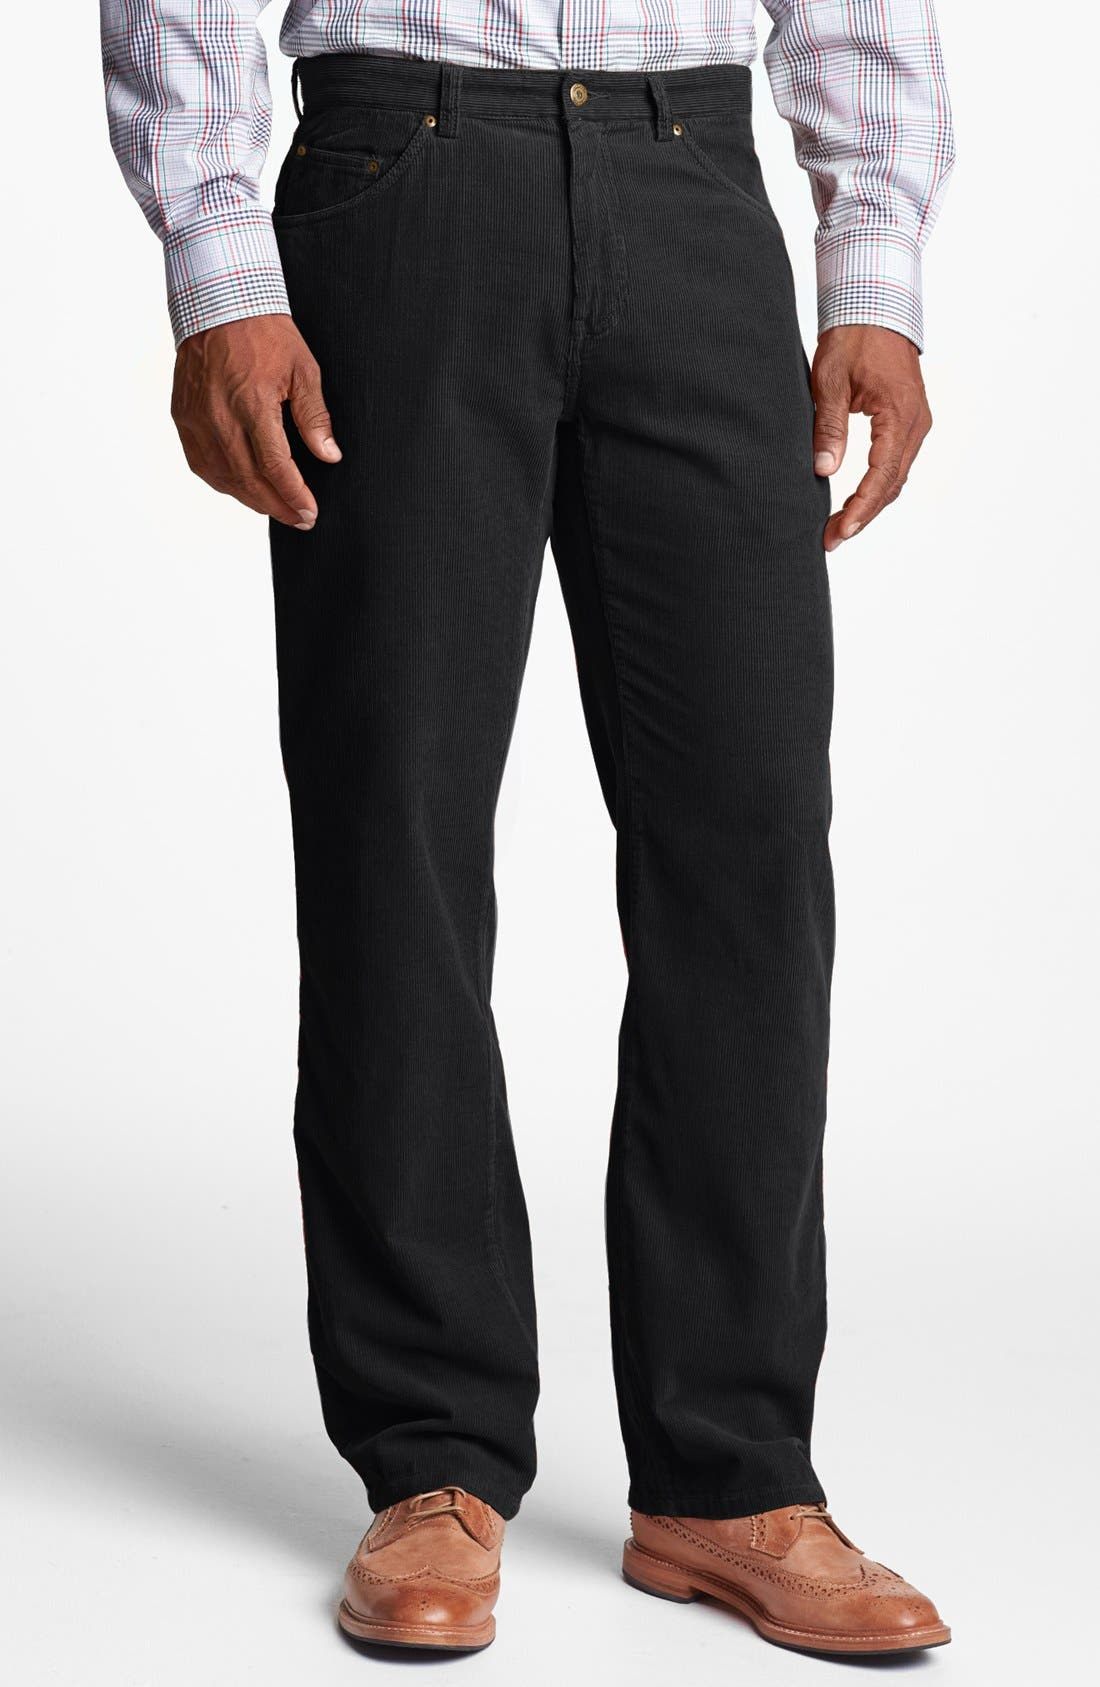 Alternate Image 1 Selected - Maker & Company Regular Fit Straight Leg Corduroy Pants